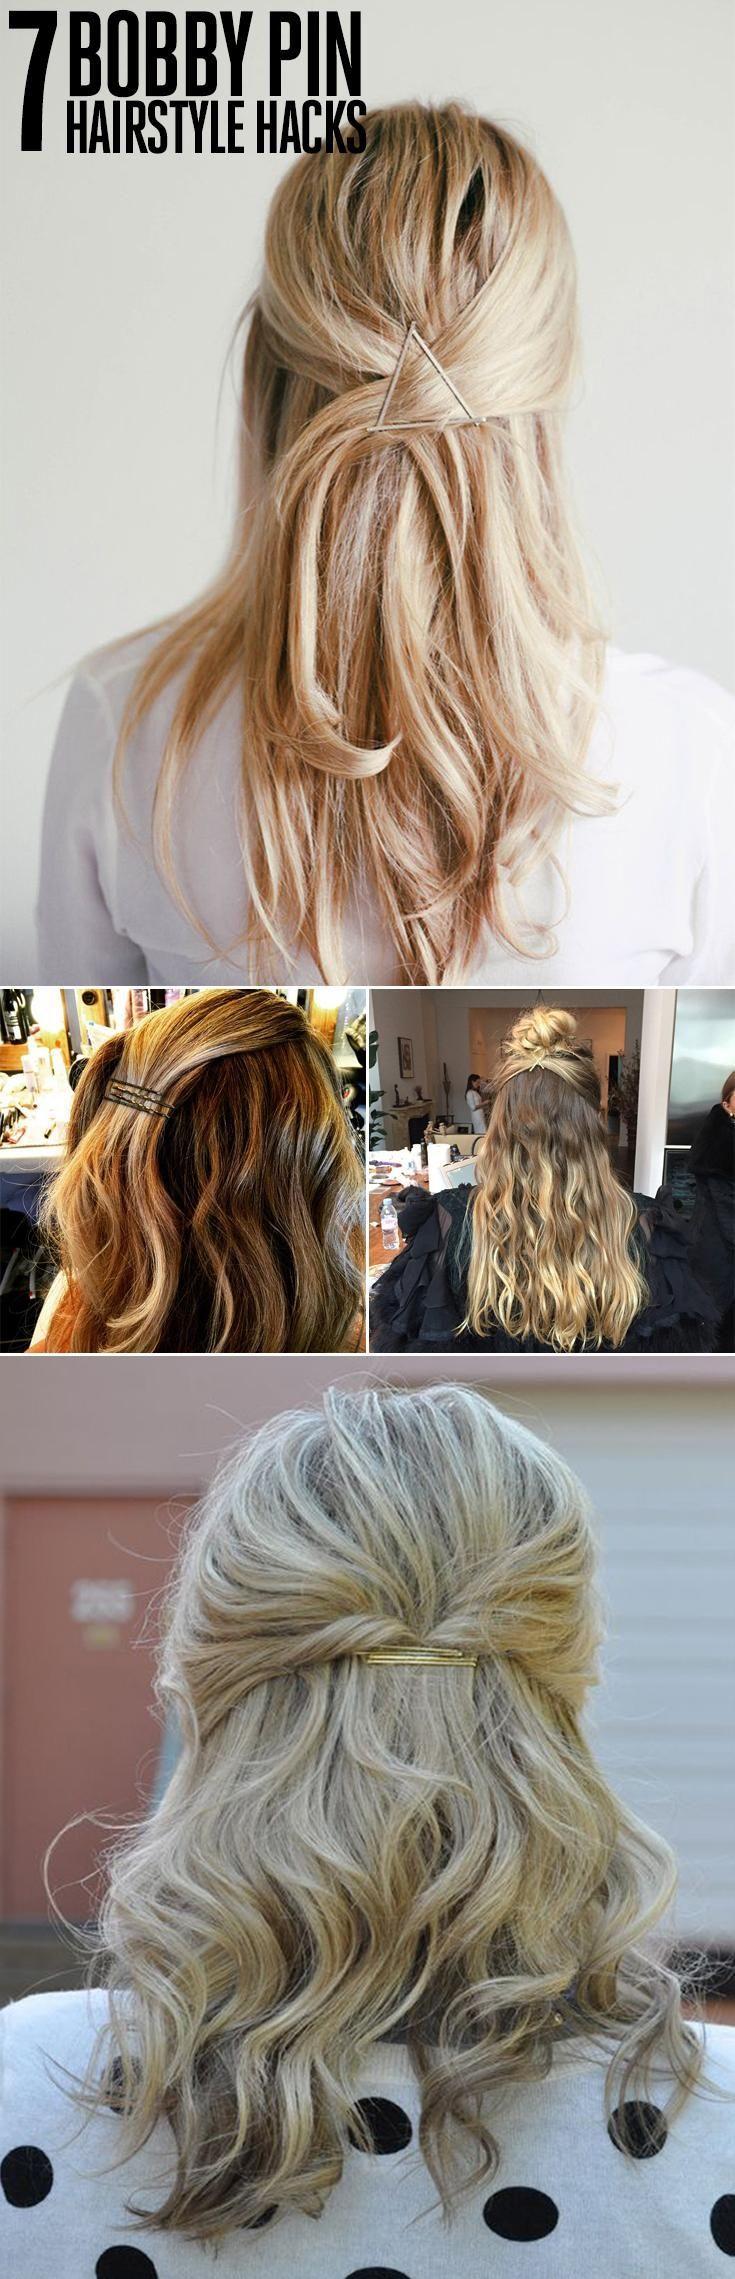 7 Bobby Pin Hairstyles